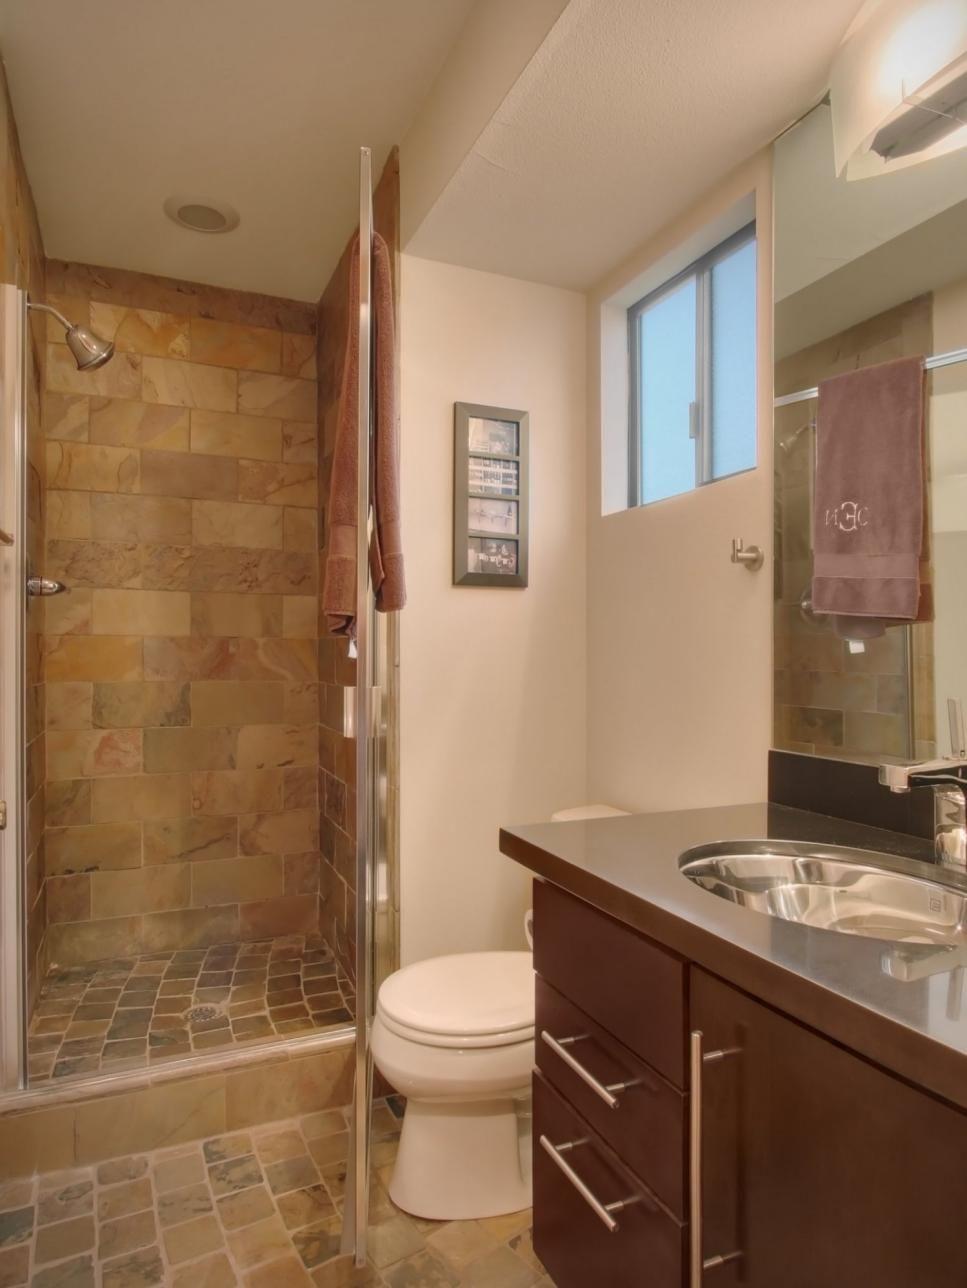 Small Bathroom Features Earth Tone Tile